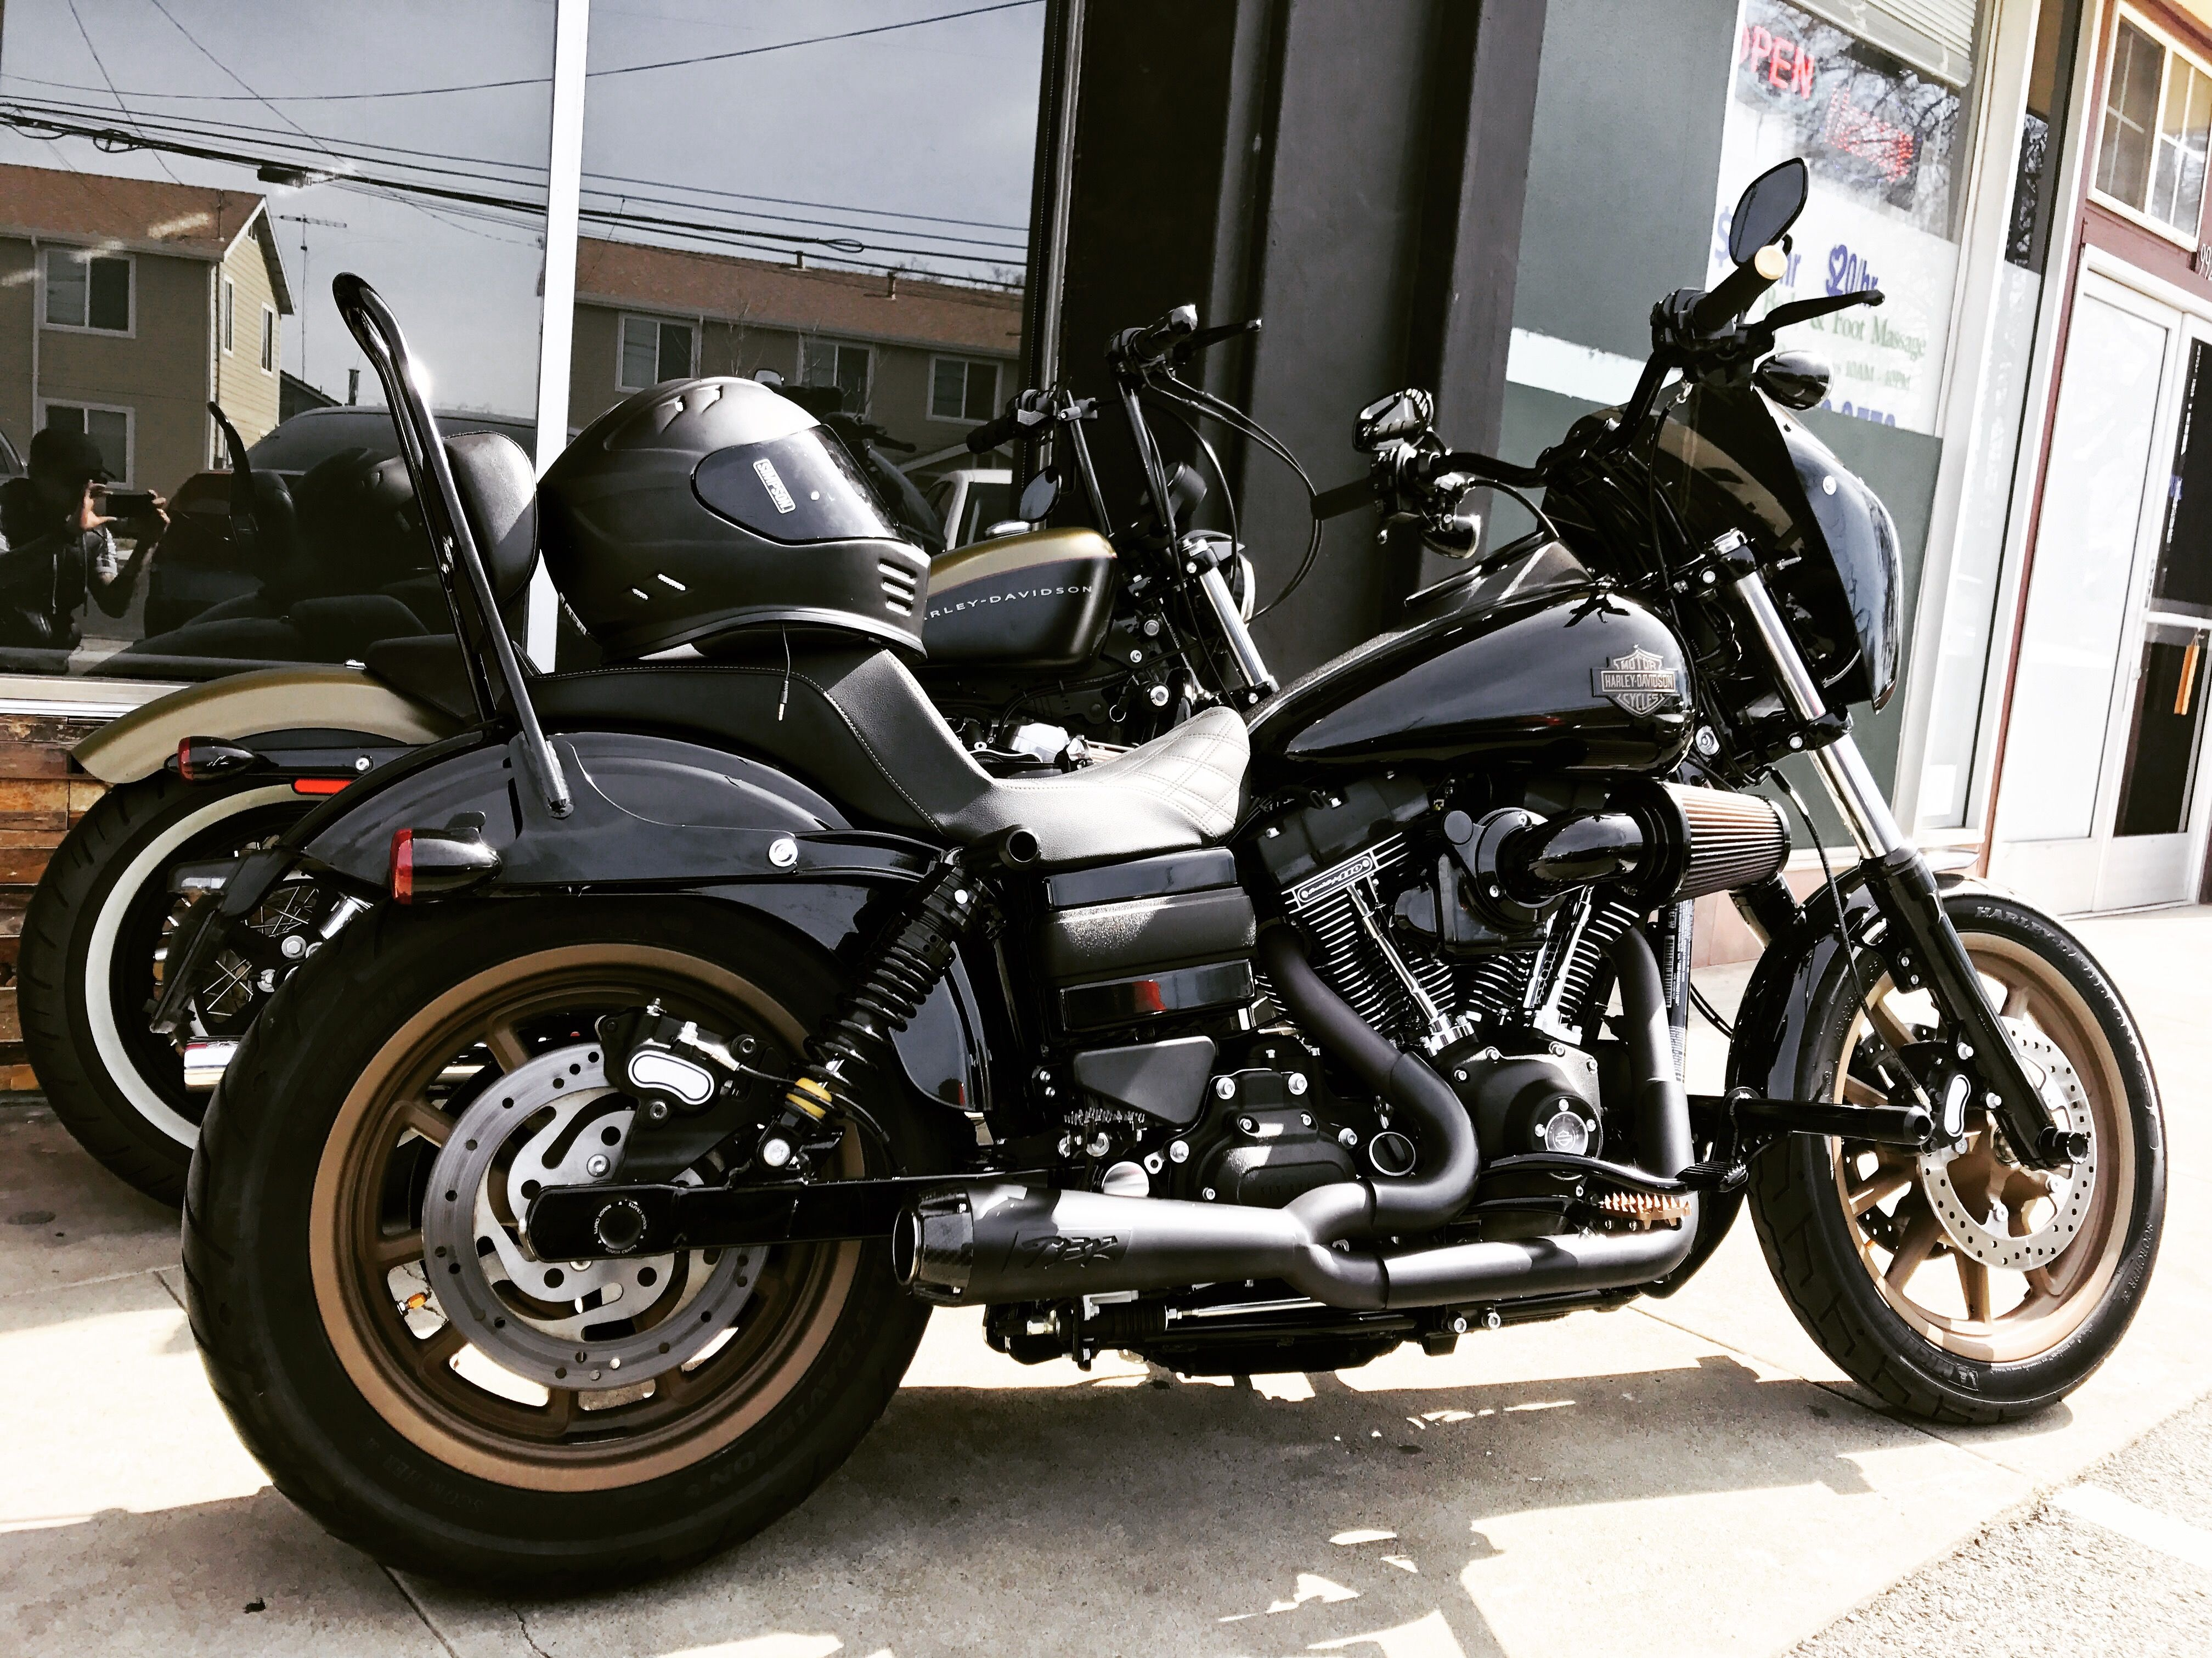 2017 Lowrider S 110 Ci Harley Dyna Harley Davidson Bikes Dyna Club Style